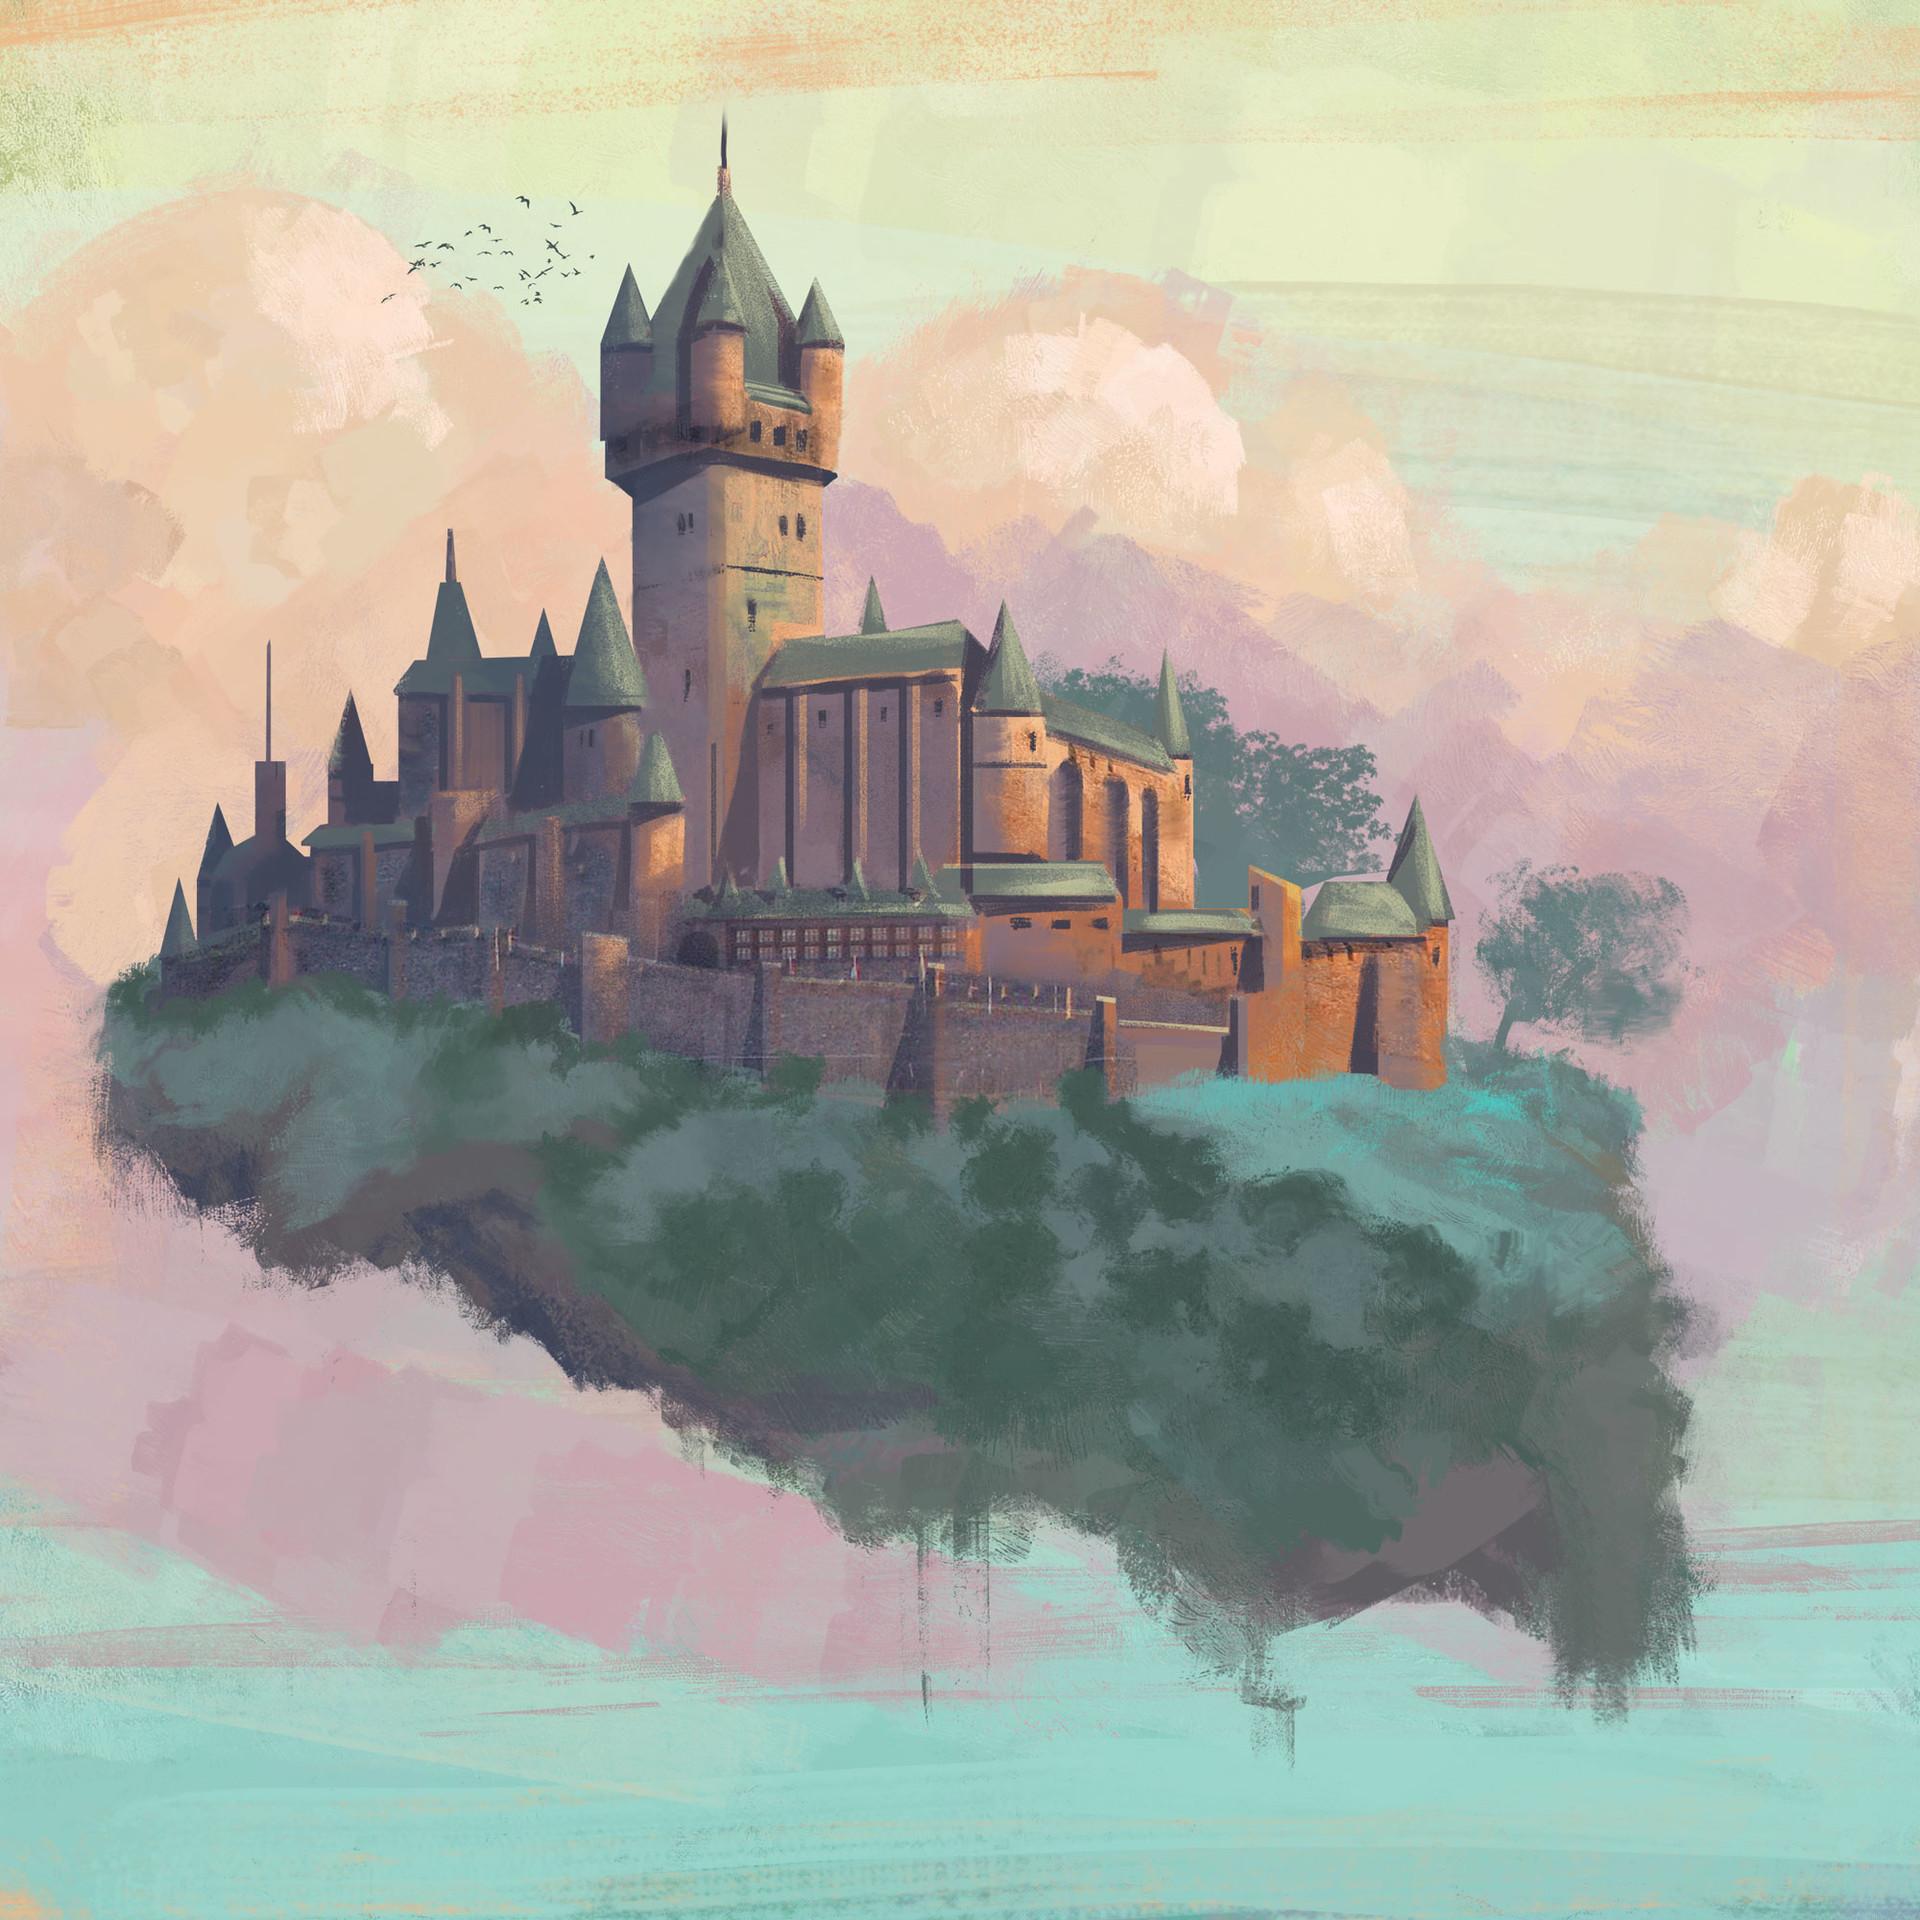 Sabina lewis 02 castle